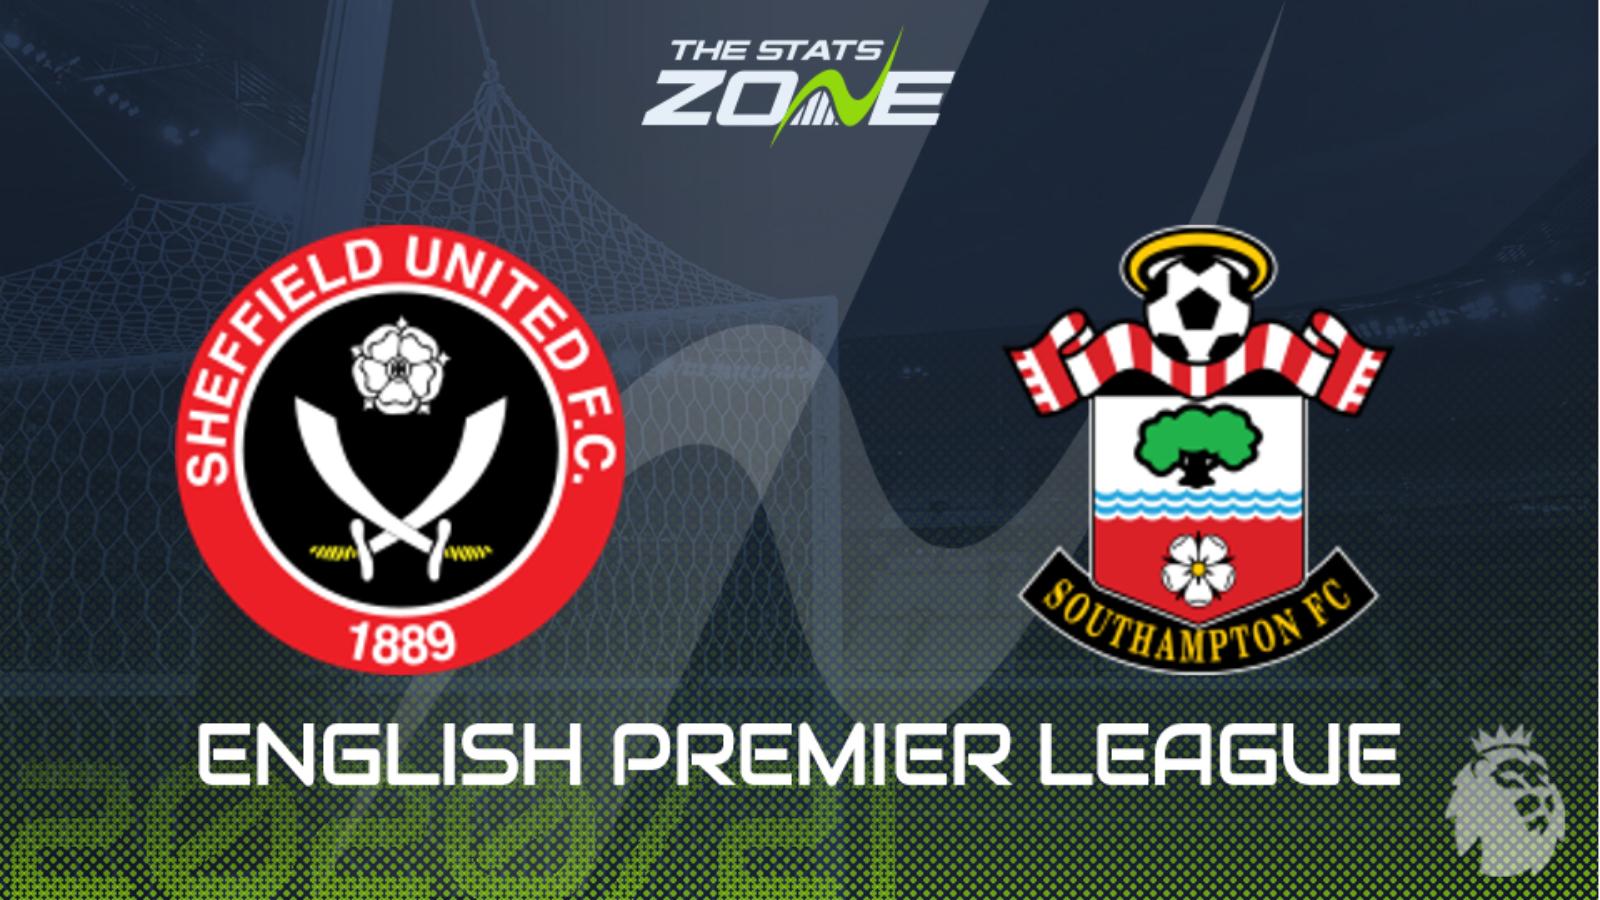 Sheffield United vs Southampton Highlights- Premier League 2020/21